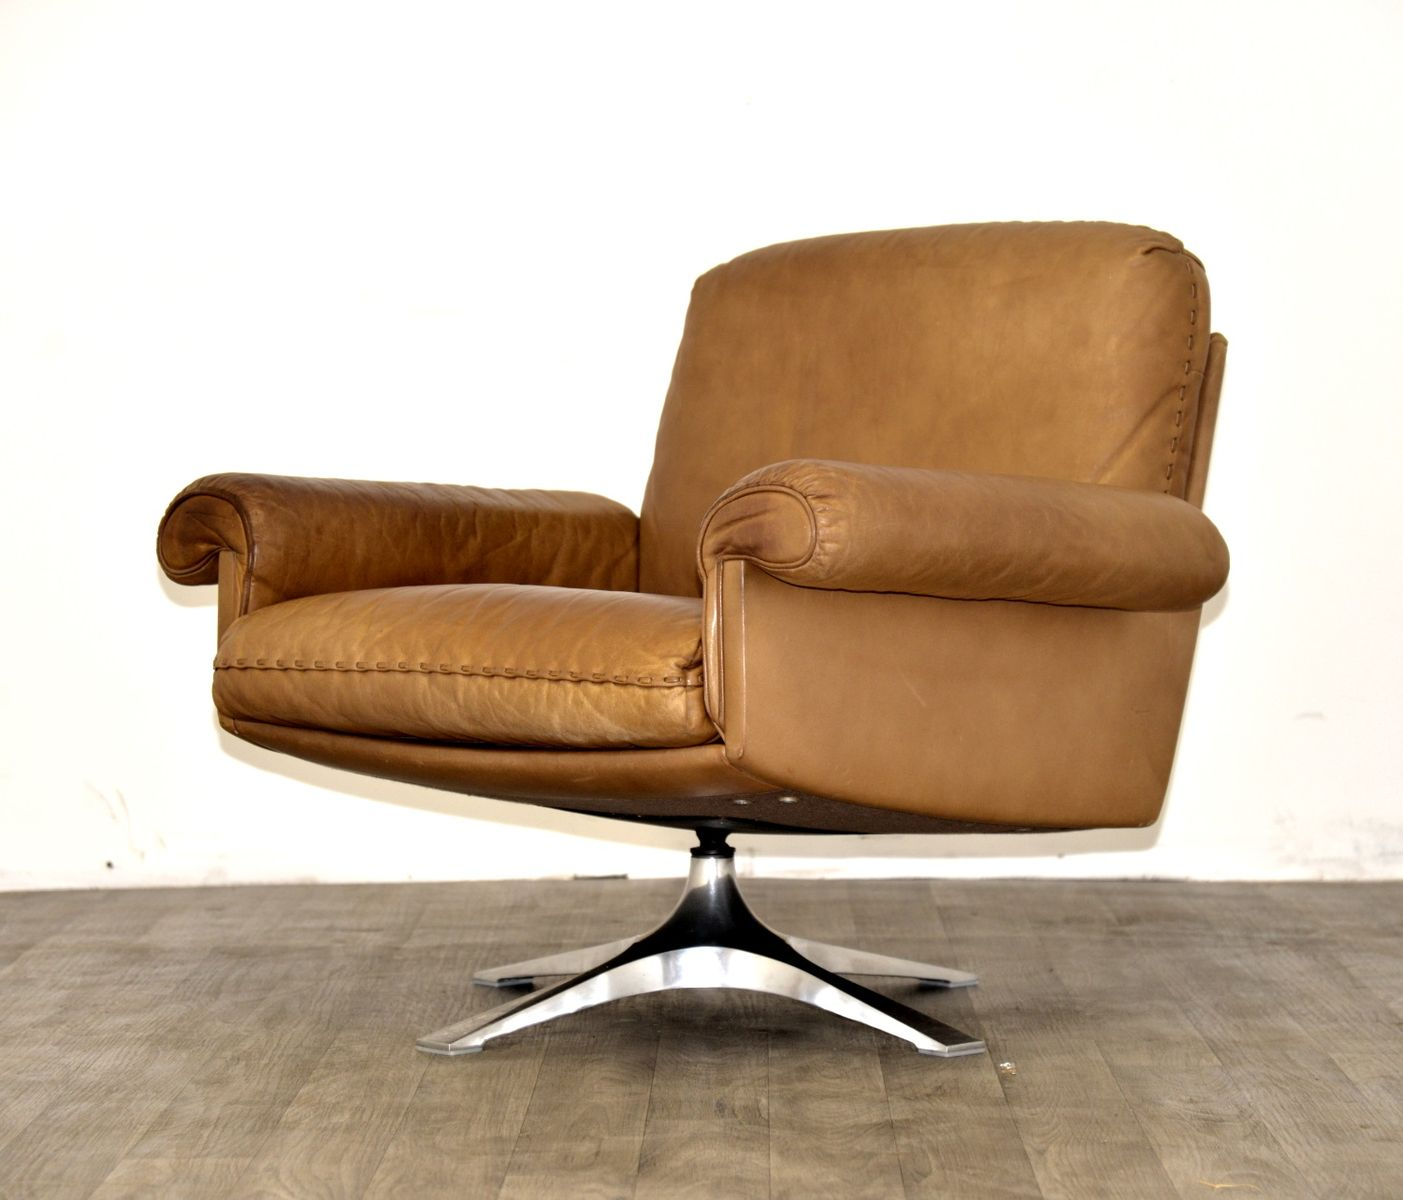 vintage ds 31 sofa und sessel von de sede 3er set bei pamono kaufen. Black Bedroom Furniture Sets. Home Design Ideas